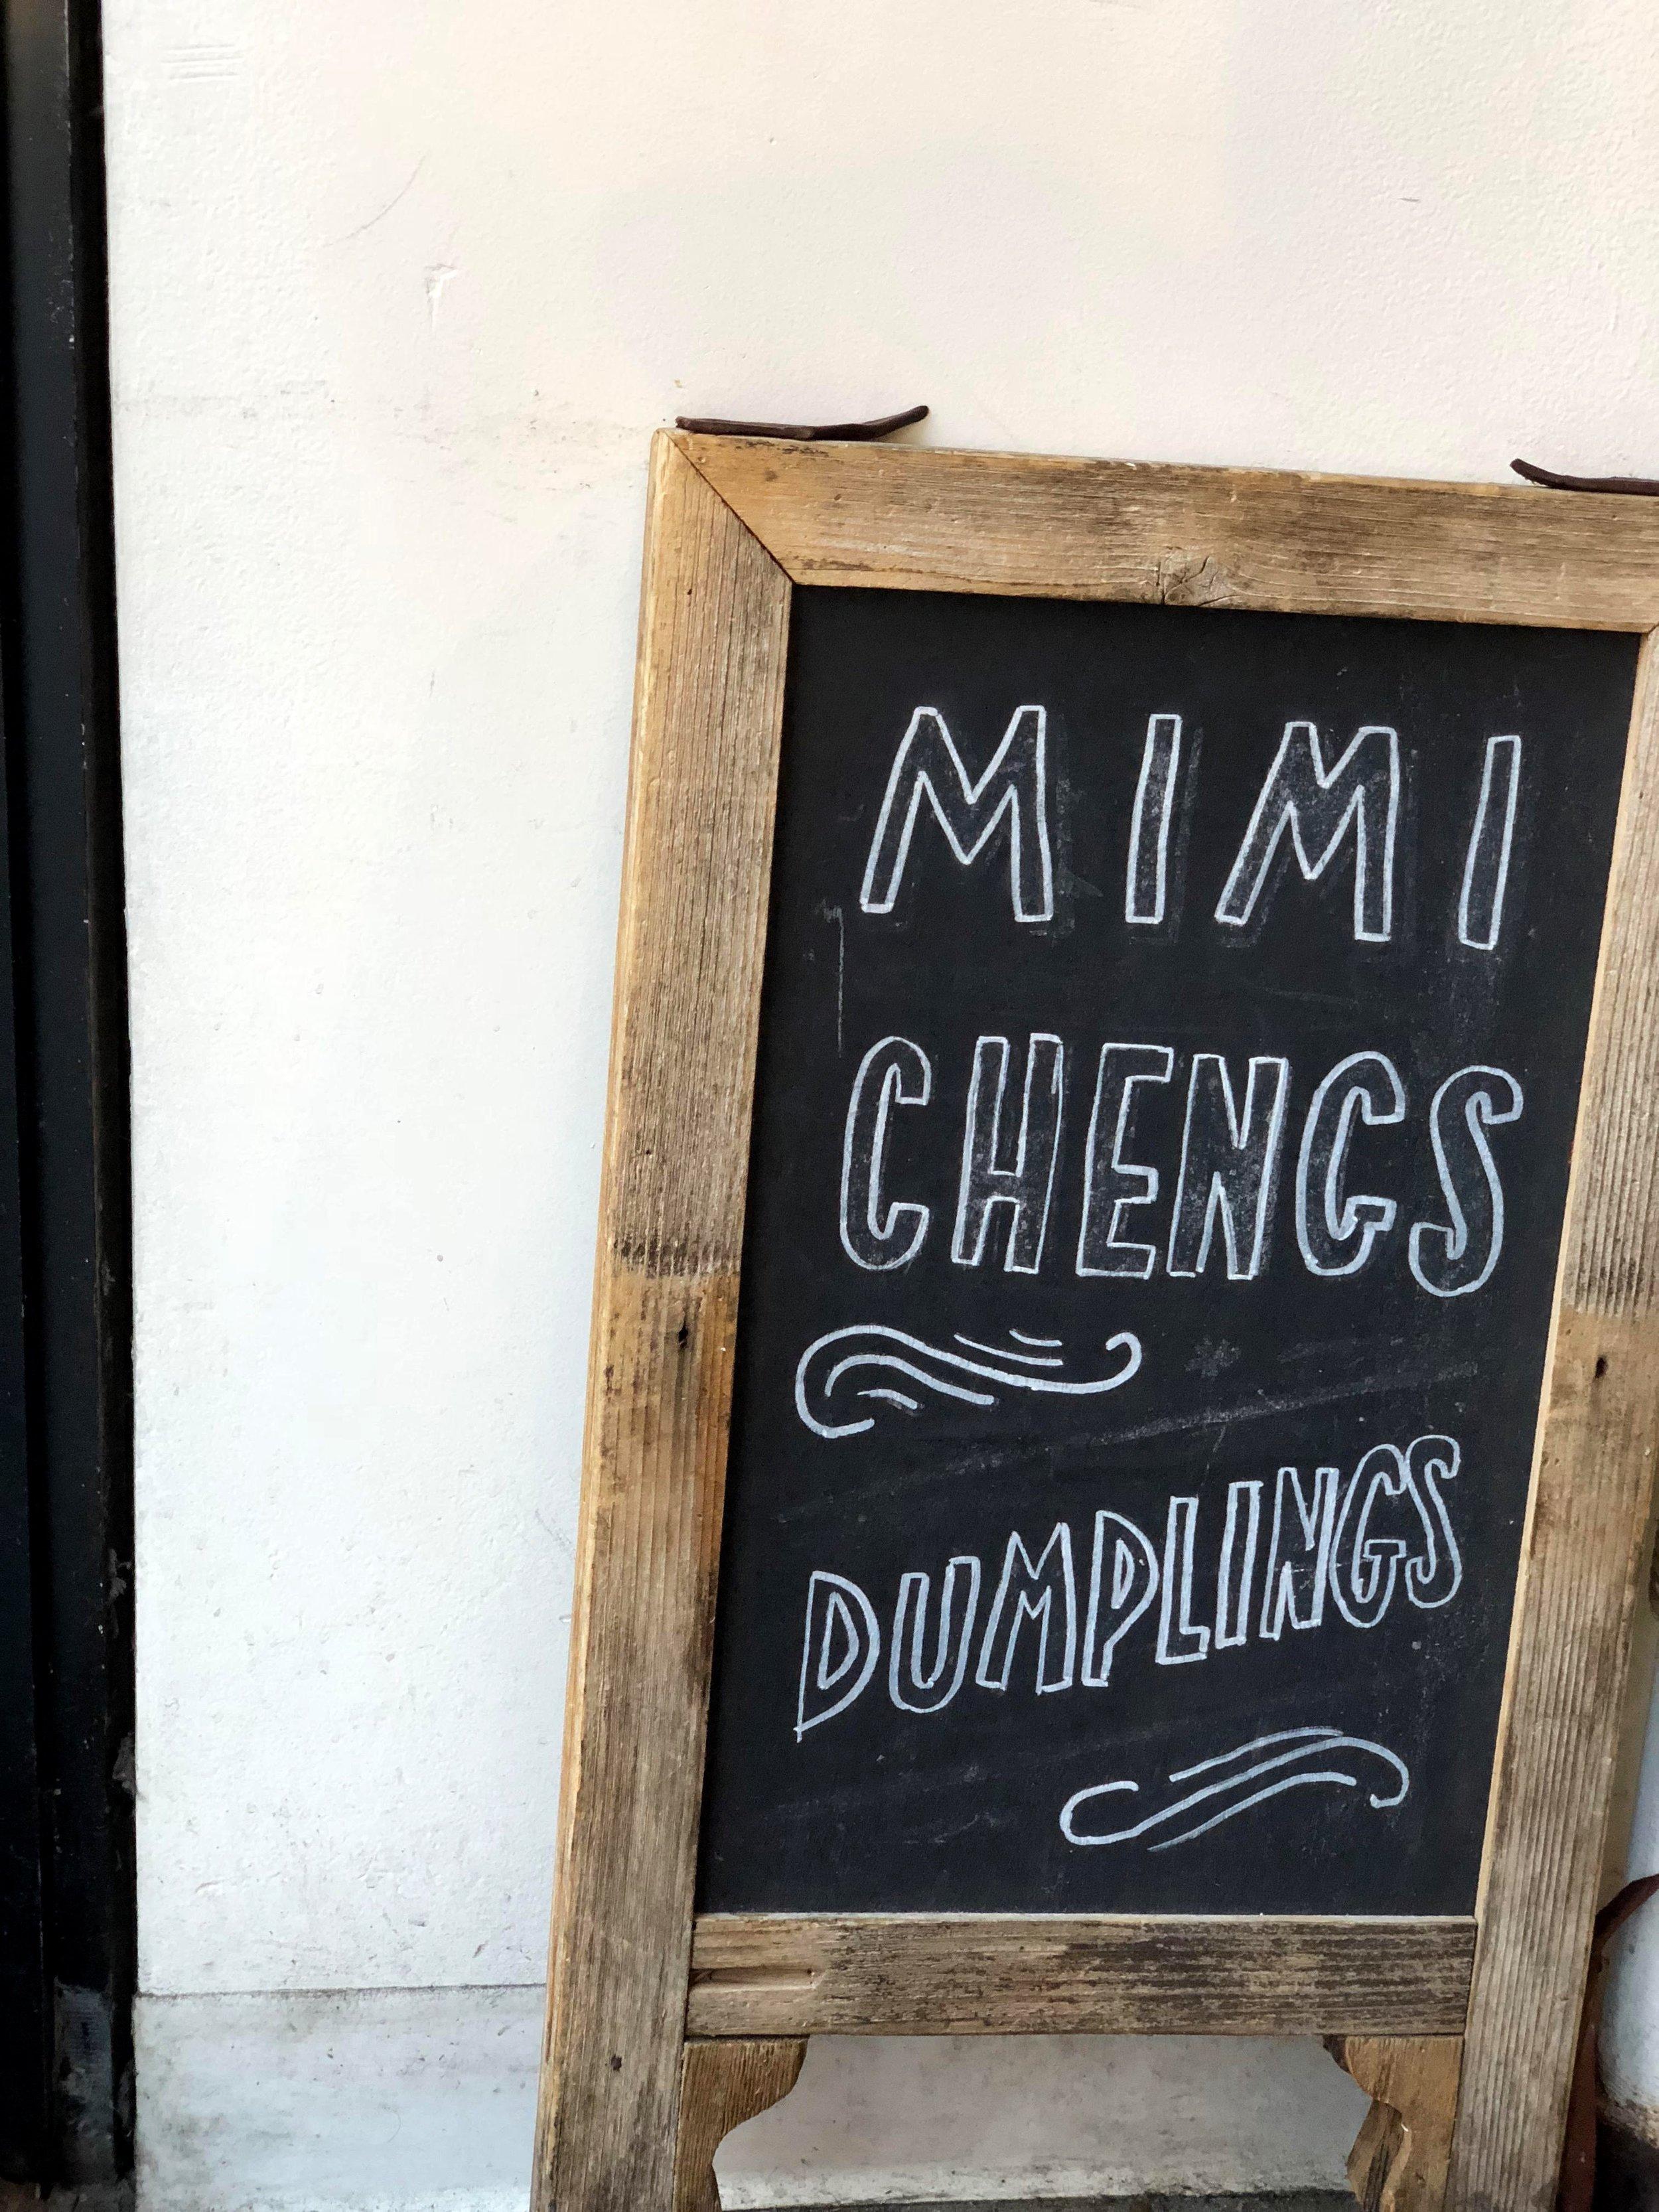 Mimi Cheng's Dumplings